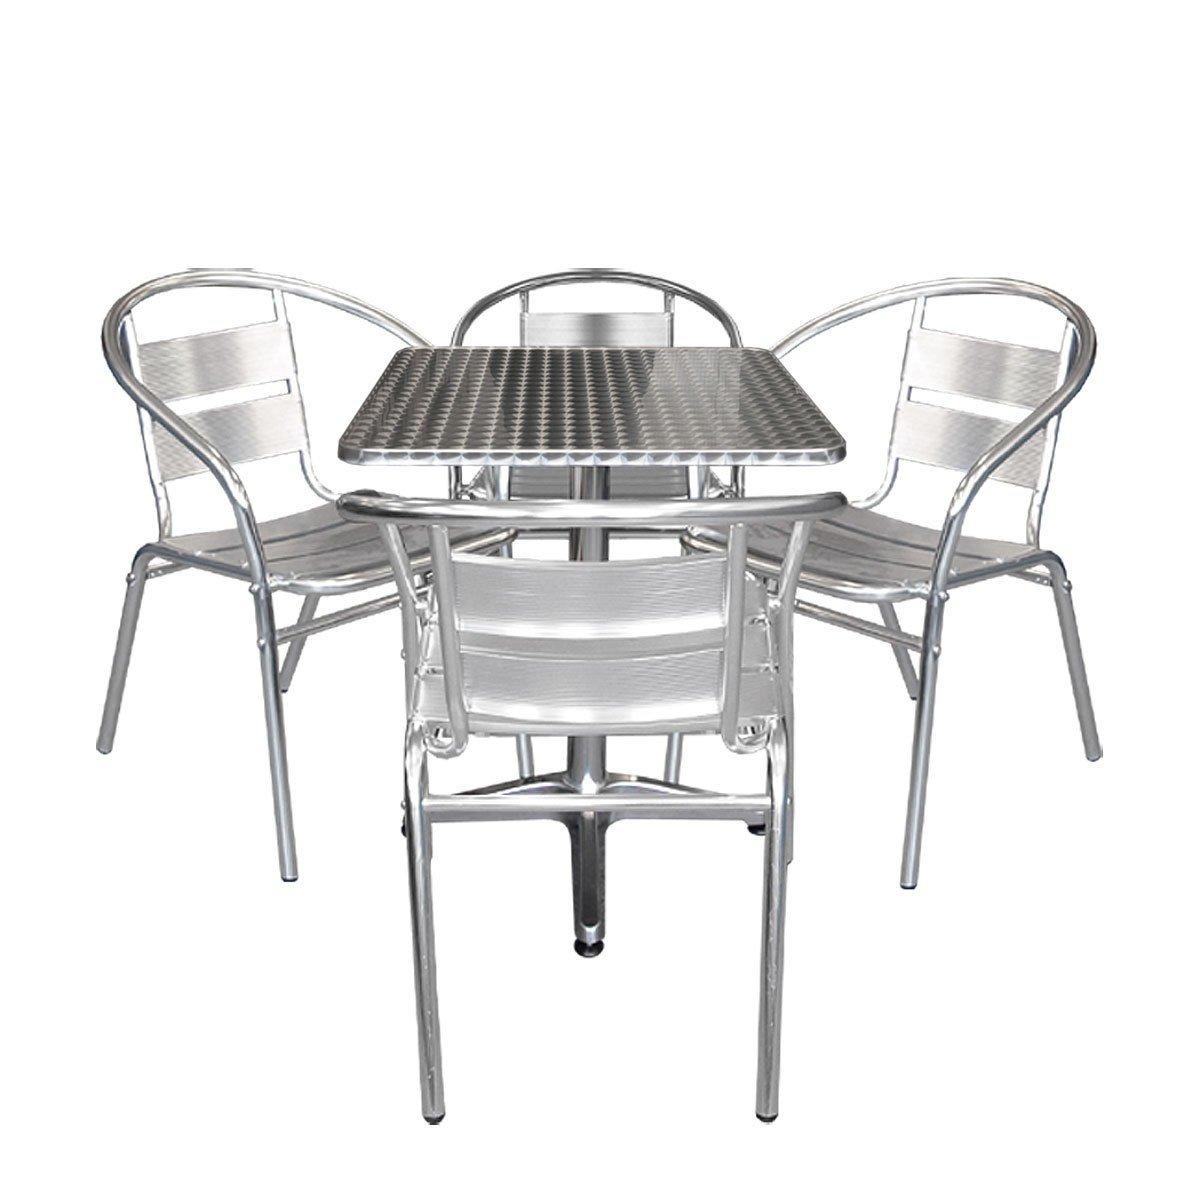 5tlg aluminium bistrom bel set bistrotisch aluminium tischplatte in schleifoptik 60x60cm. Black Bedroom Furniture Sets. Home Design Ideas